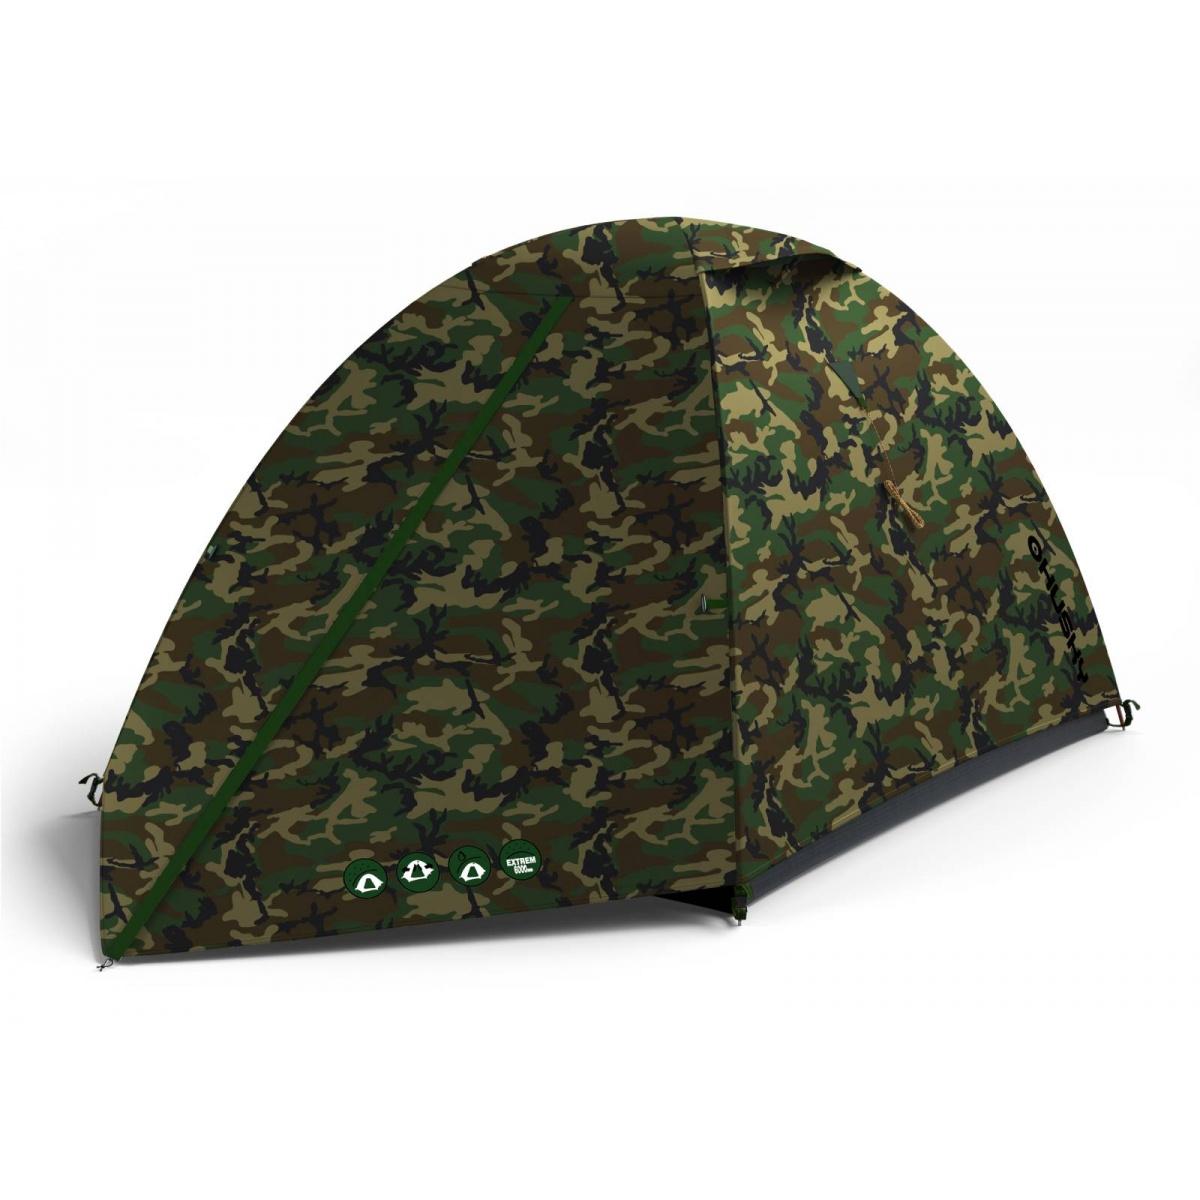 BIZAM 2 палатка (камуфляж)